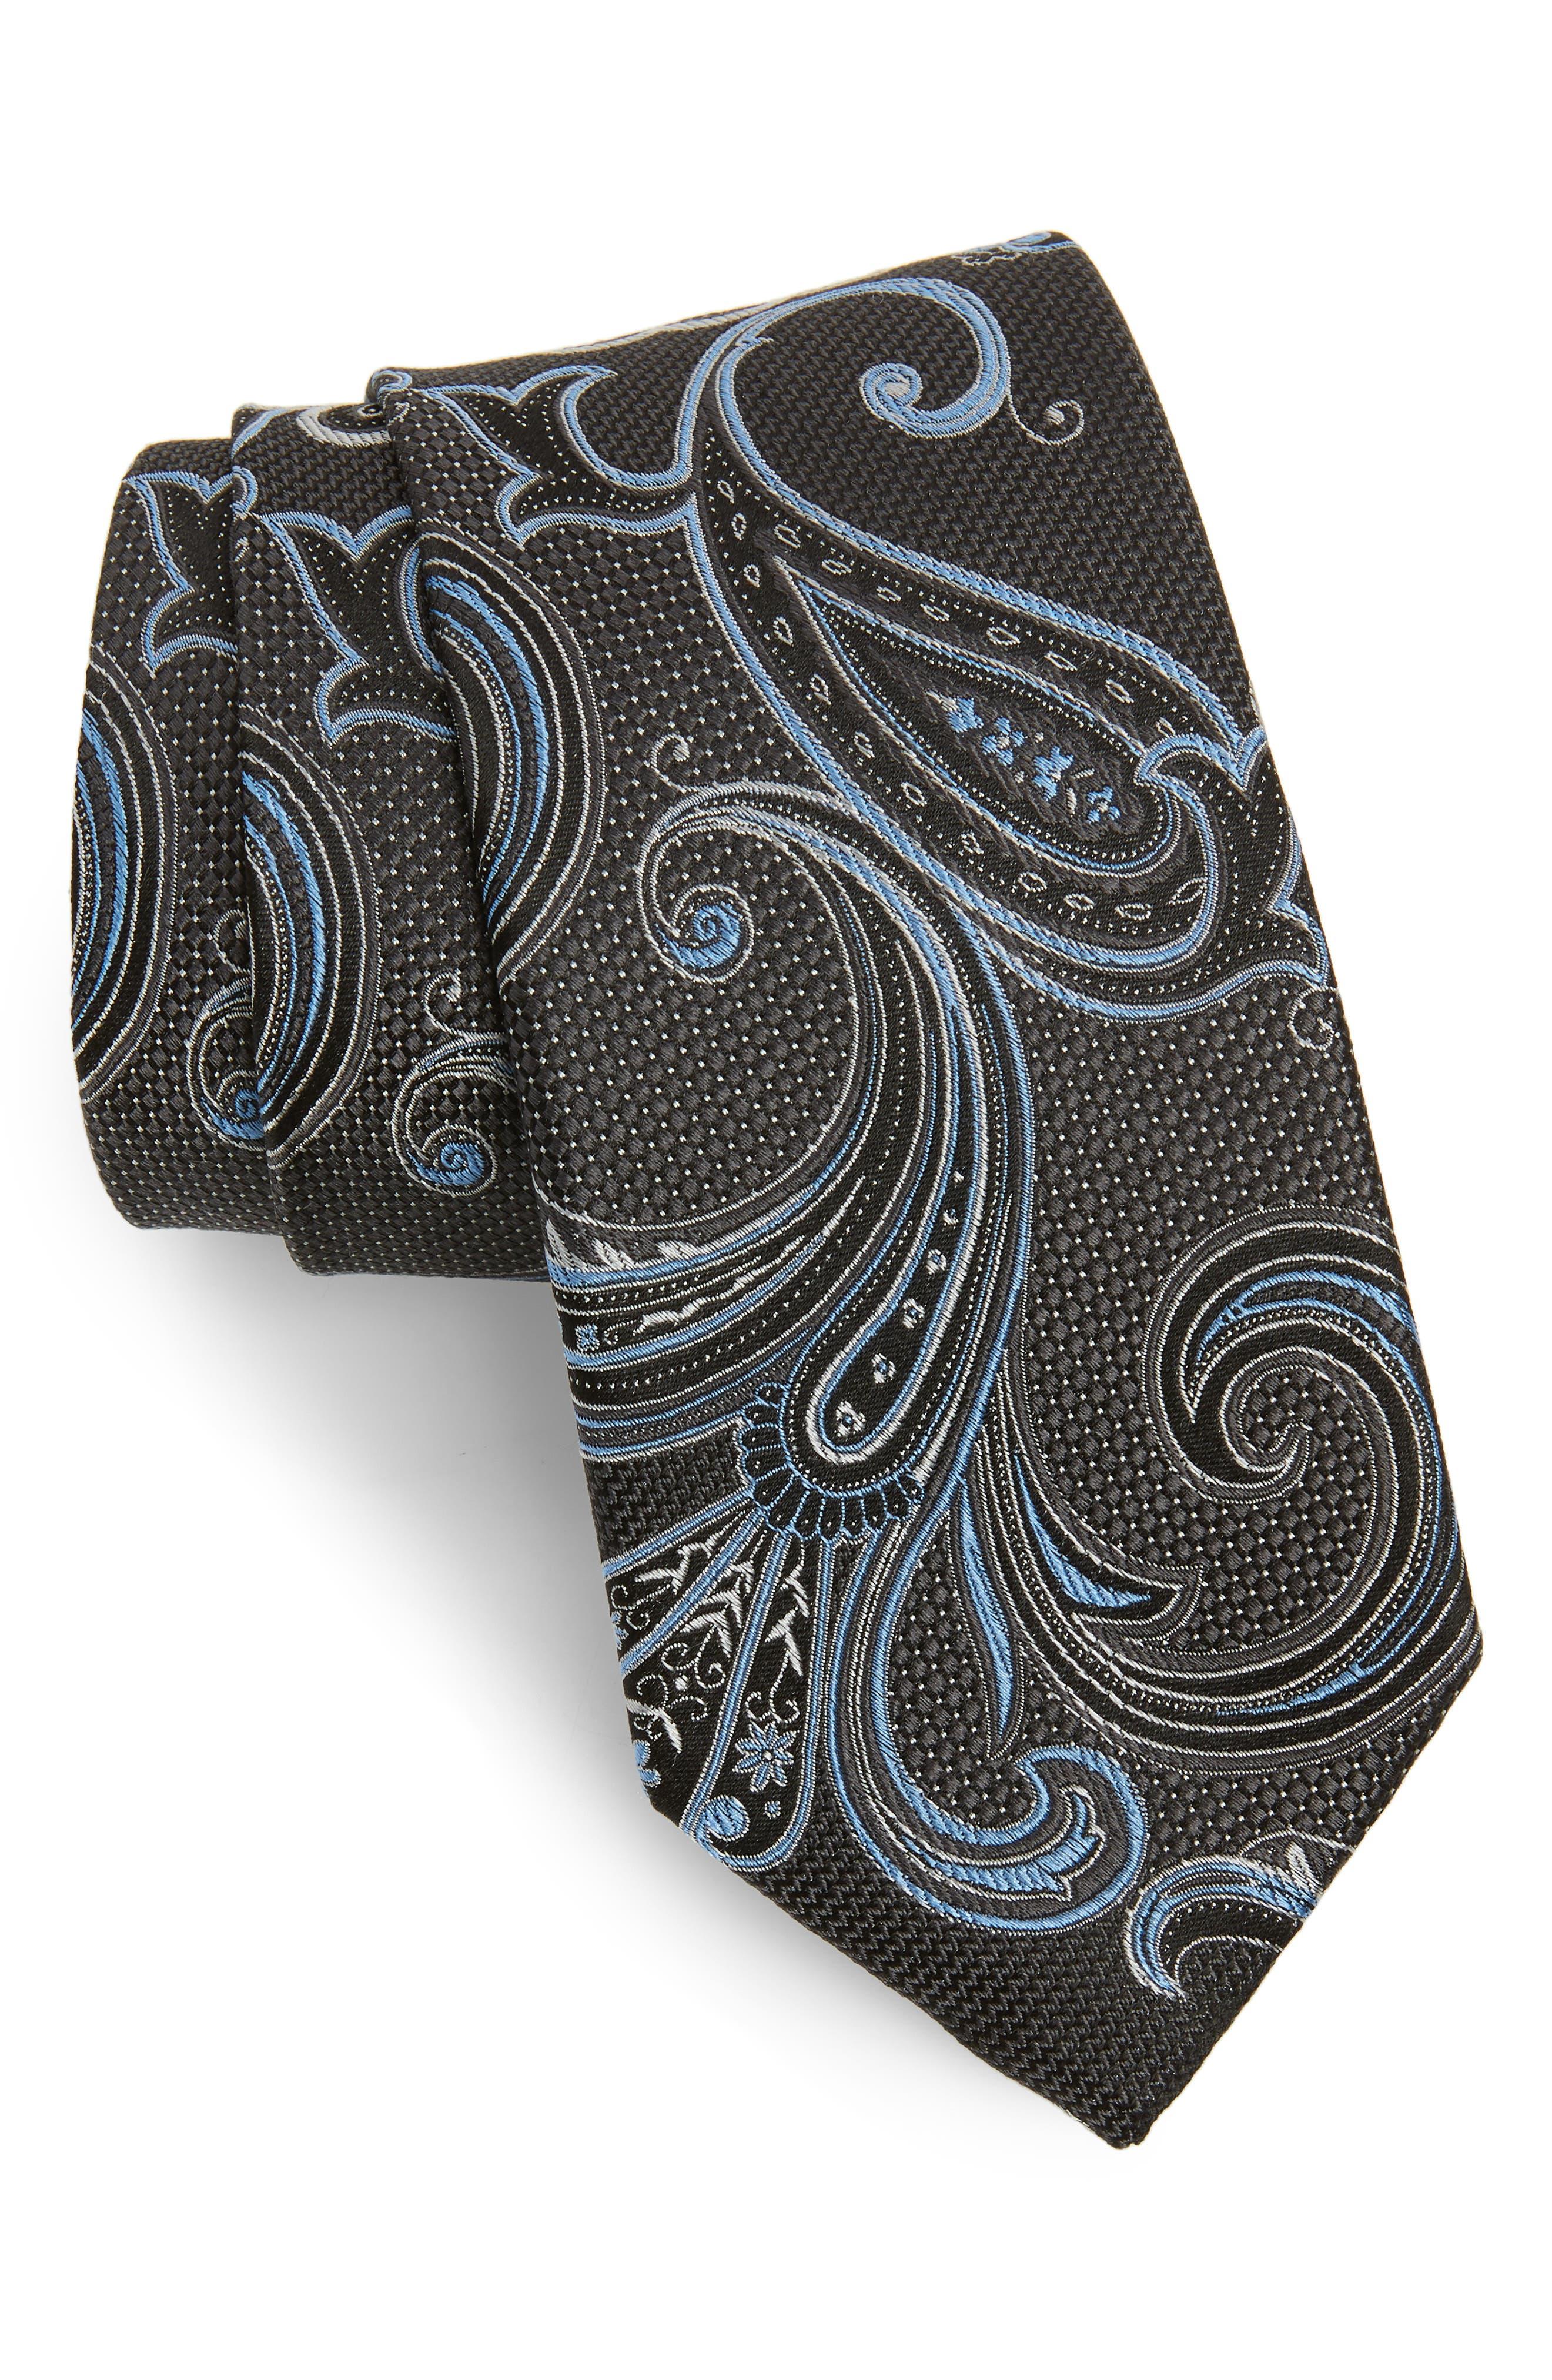 NORDSTROM MEN'S SHOP Bryce Paisley Silk Tie, Main, color, CHARCOAL